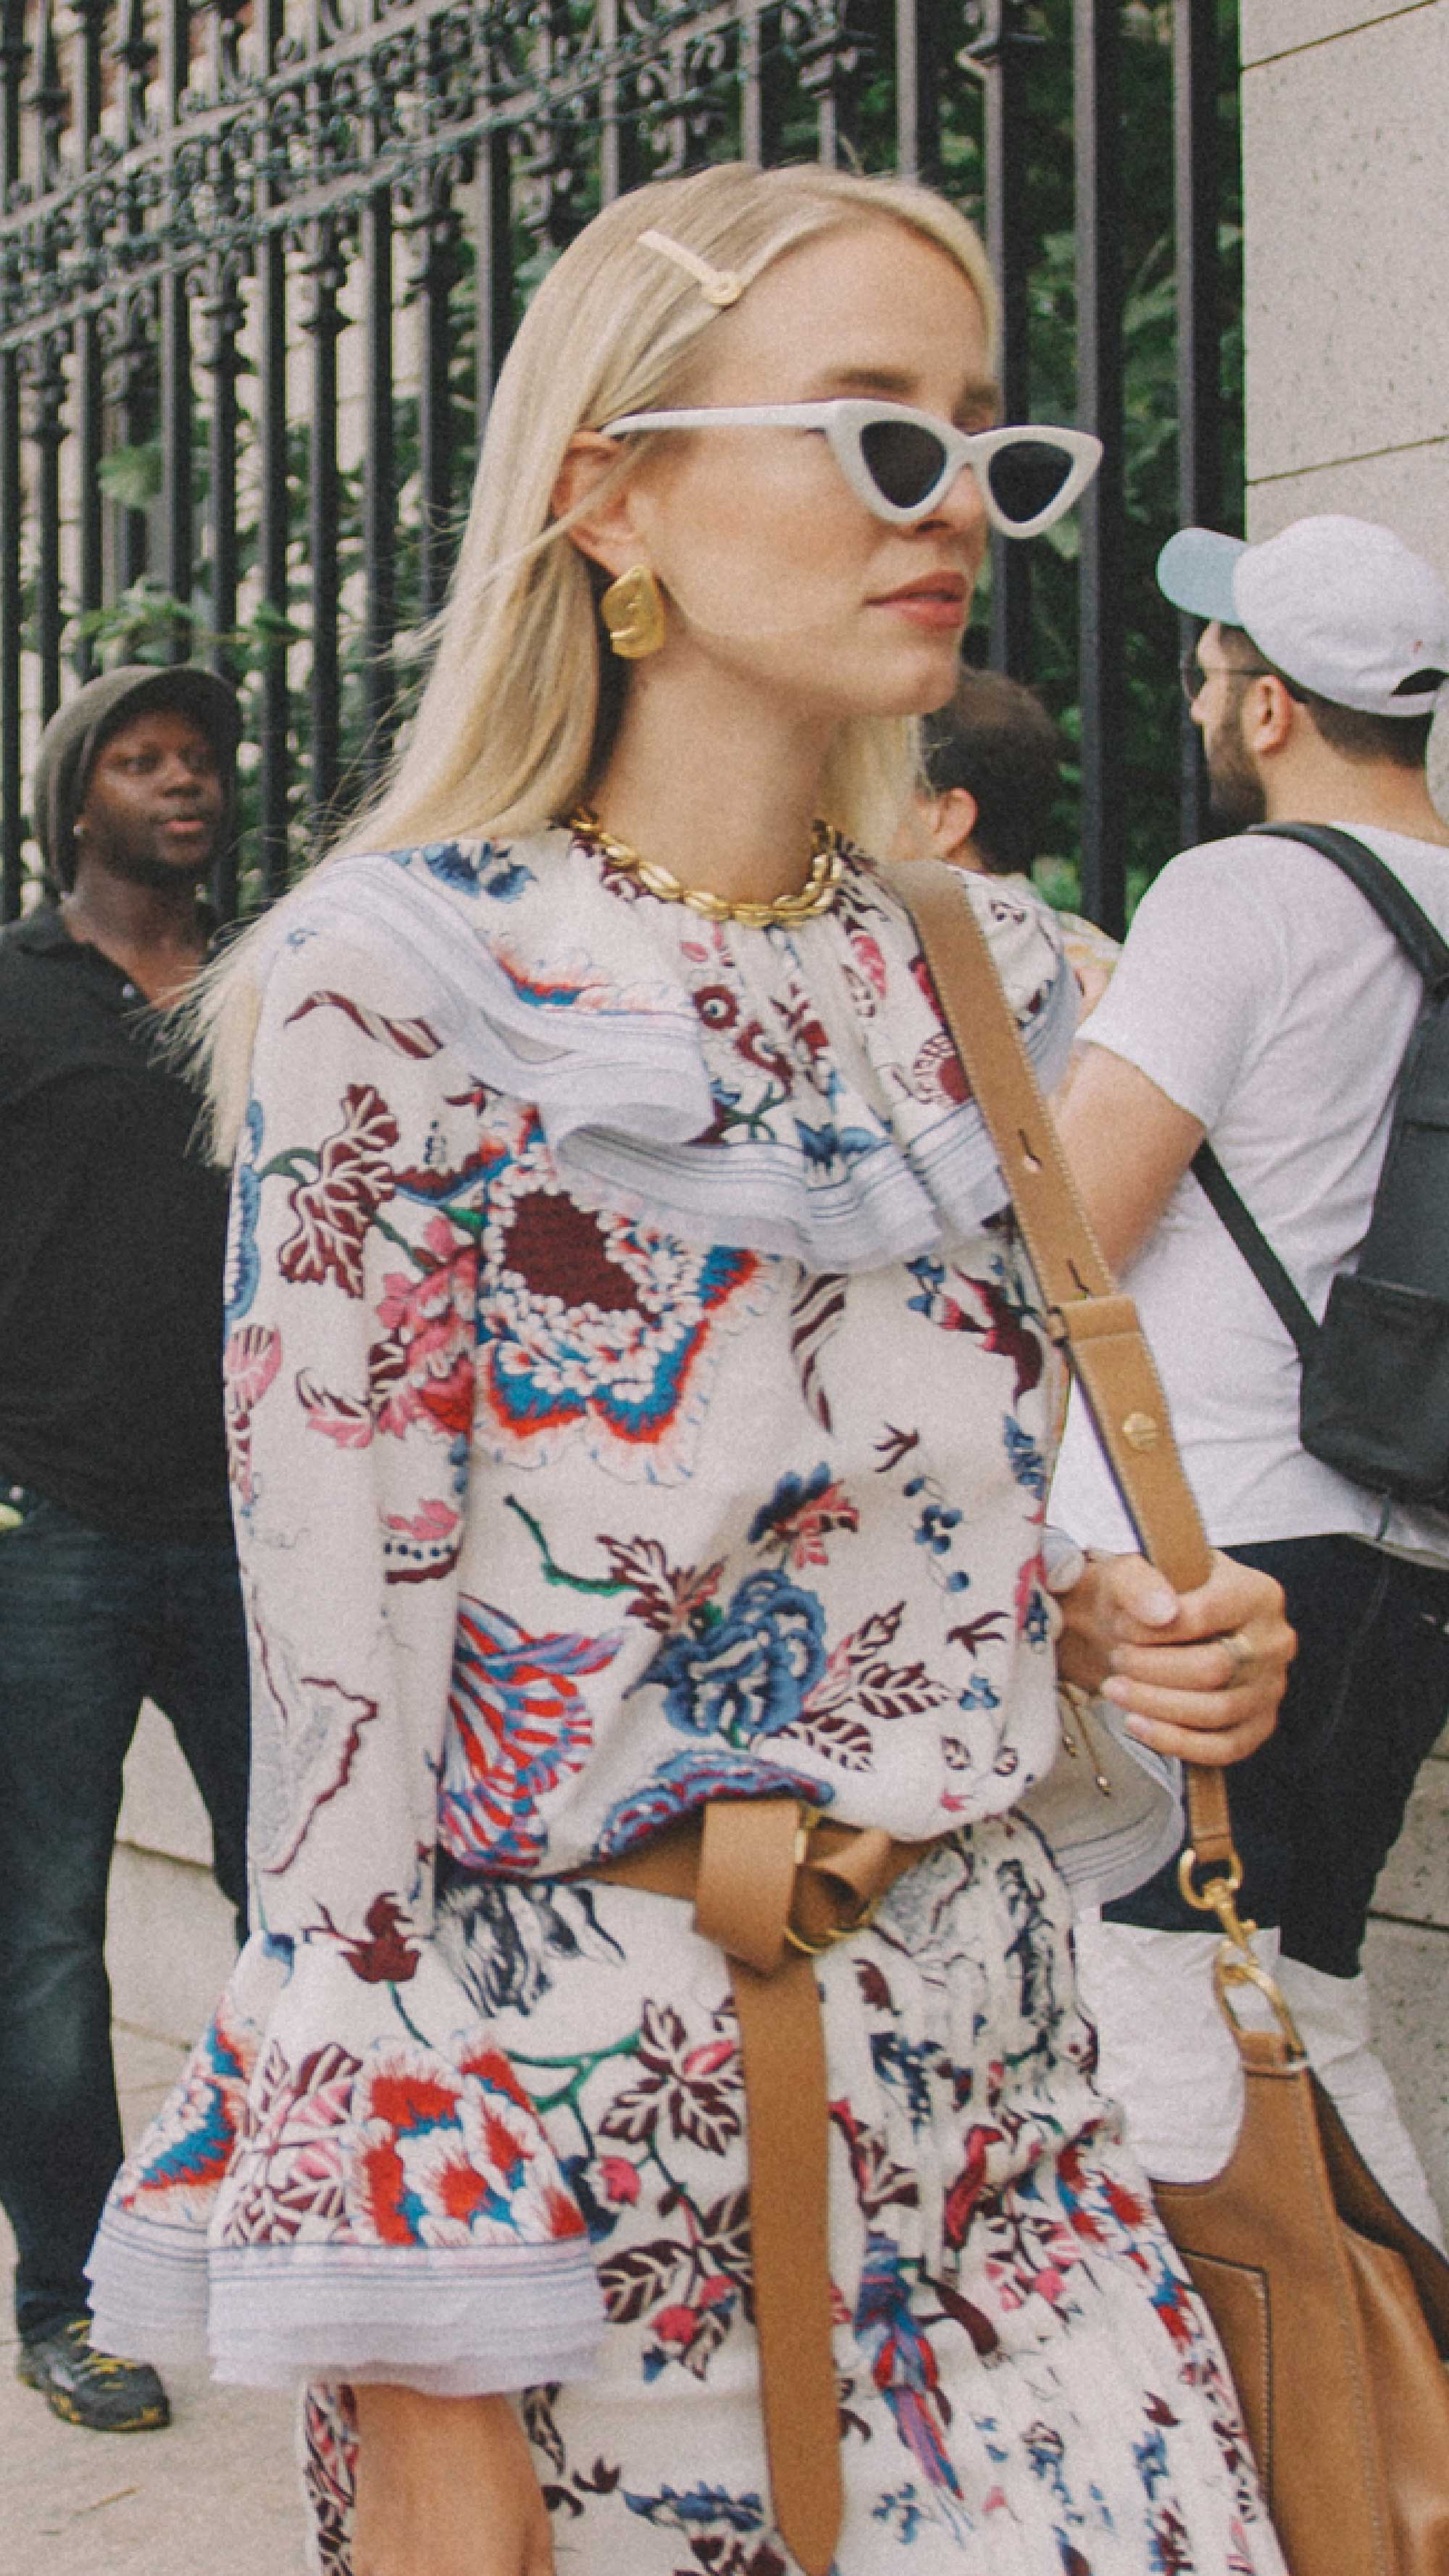 New-York-Fashion-Week-NYFW-SS18-street-style-day-two-SS18.jpg5.jpg